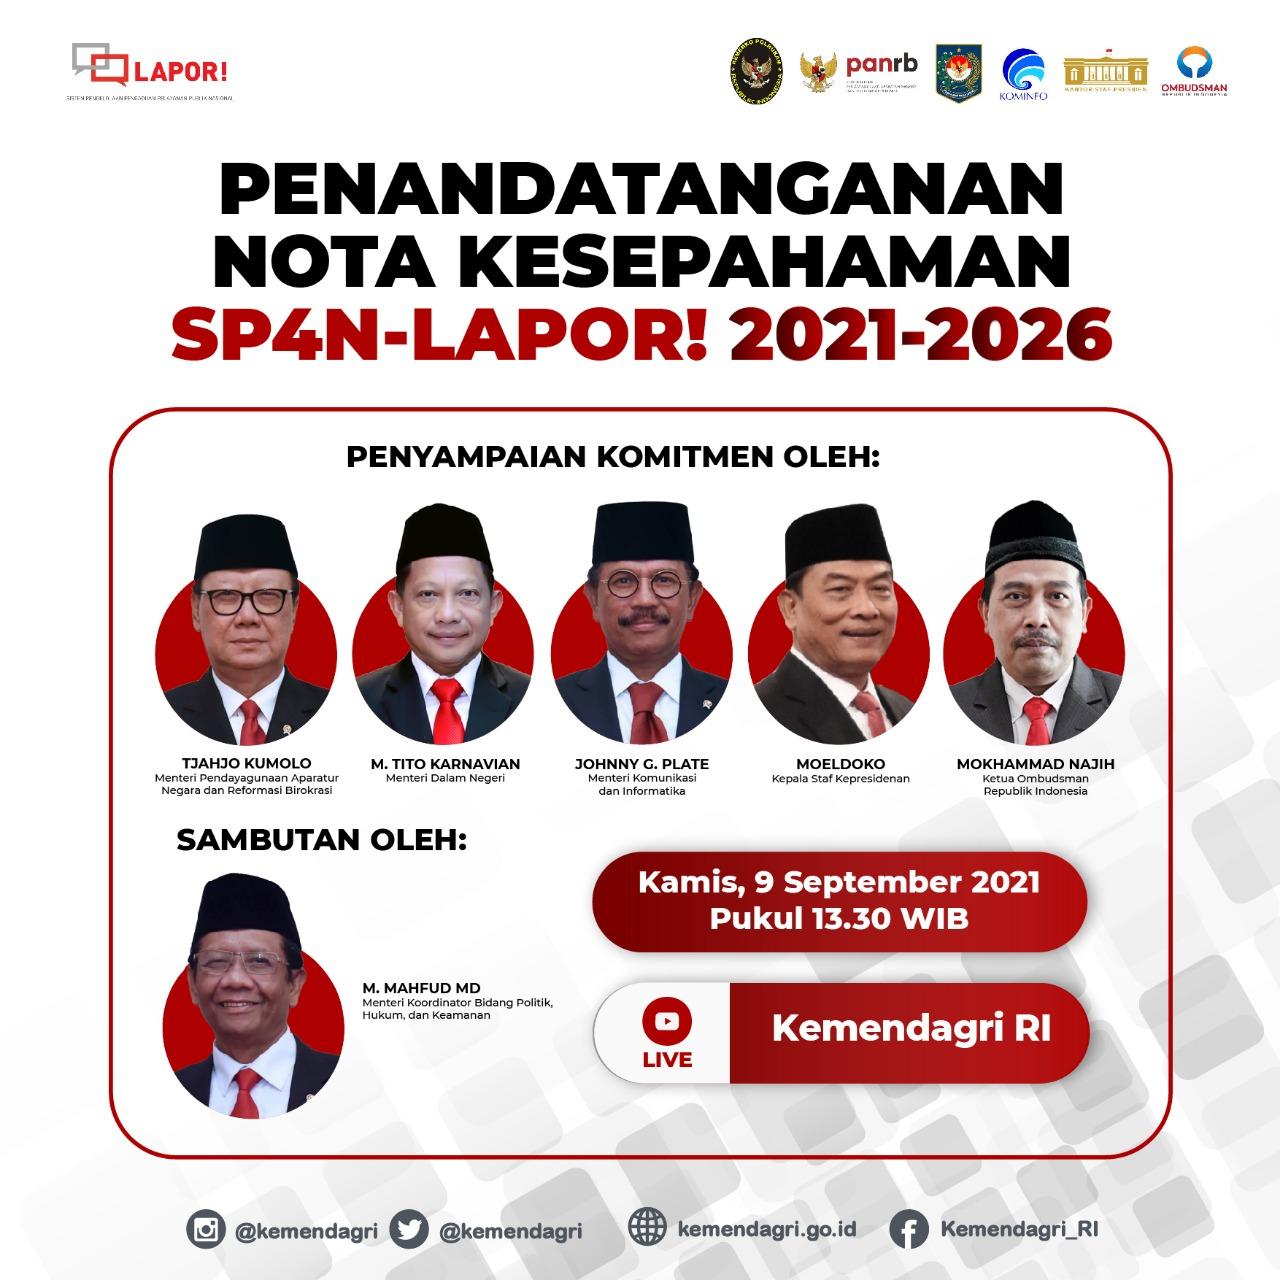 Perkuat SP4N-LAPOR!, Kemendagri dan Kementerian Kominfo Bakal Dilibatkan